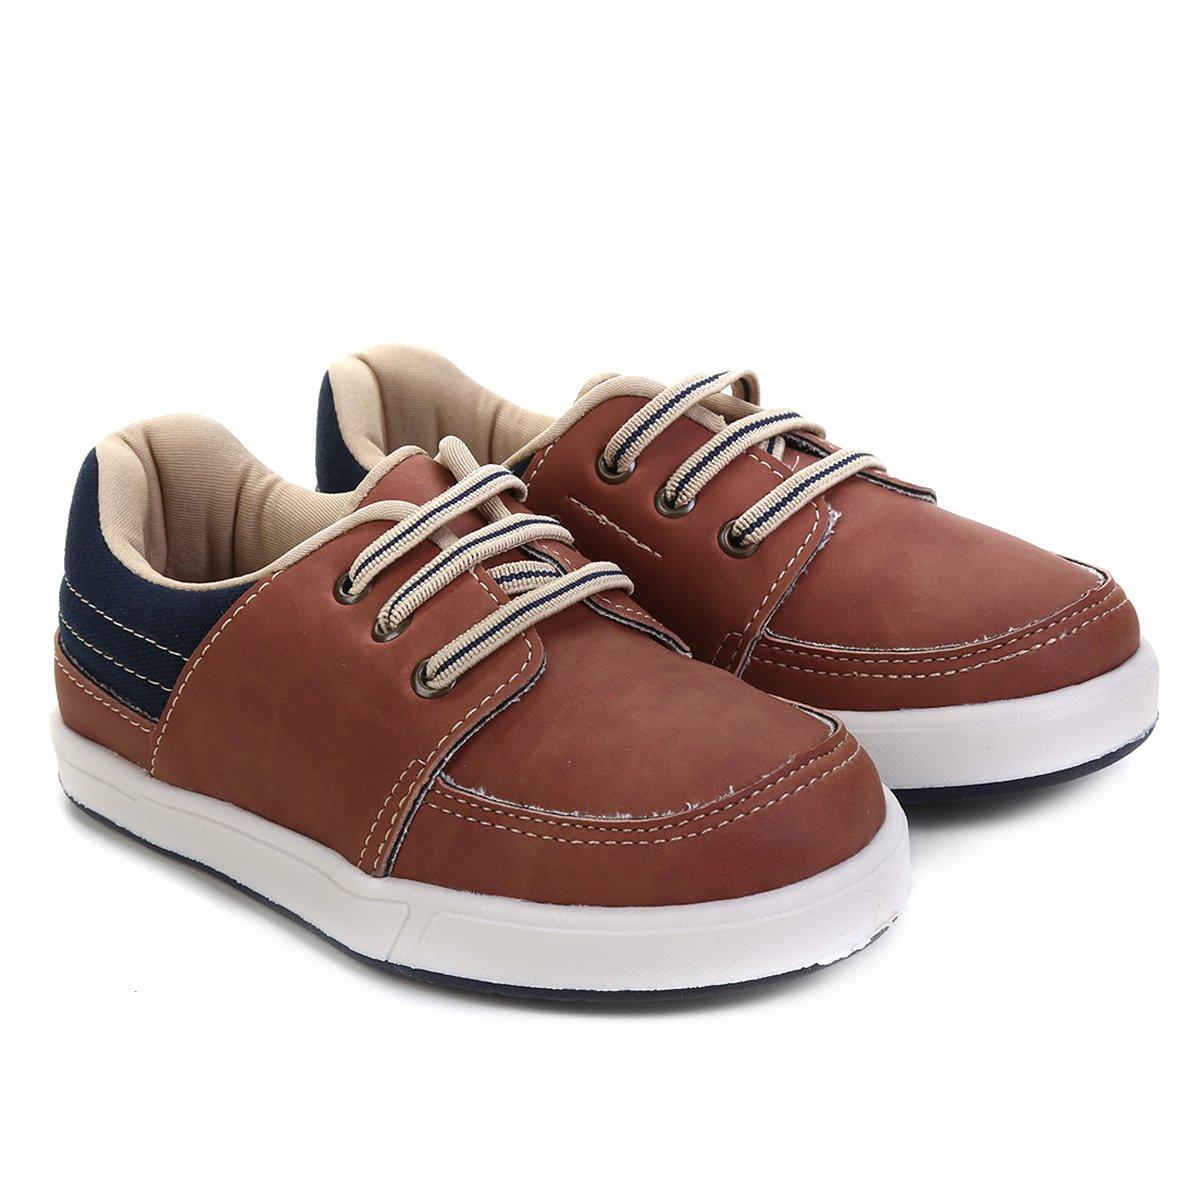 1d56ba71d Sapato Infantil Pimpolho Básico Masculino